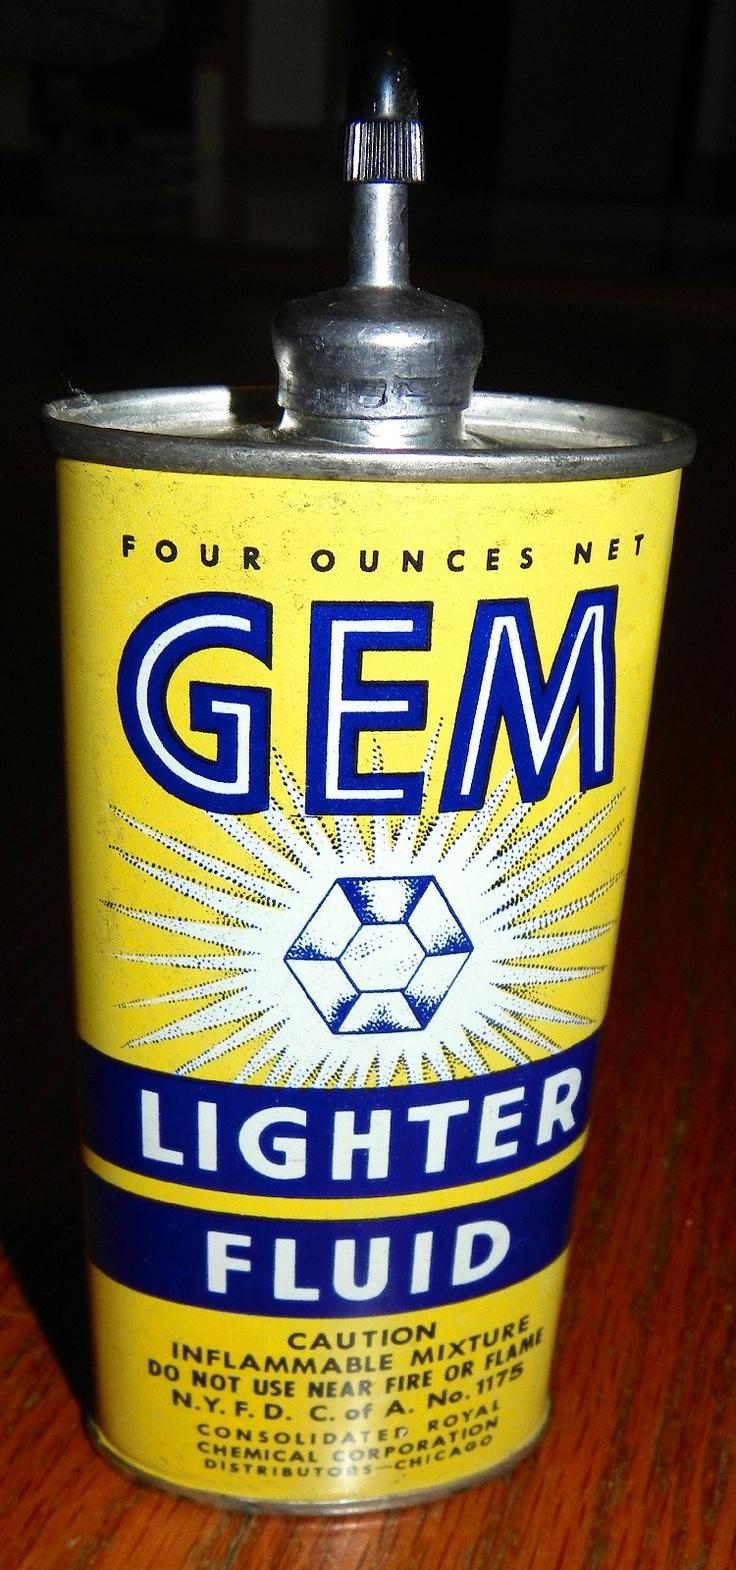 Gem lighter fluid vintage lighter fluid fluid